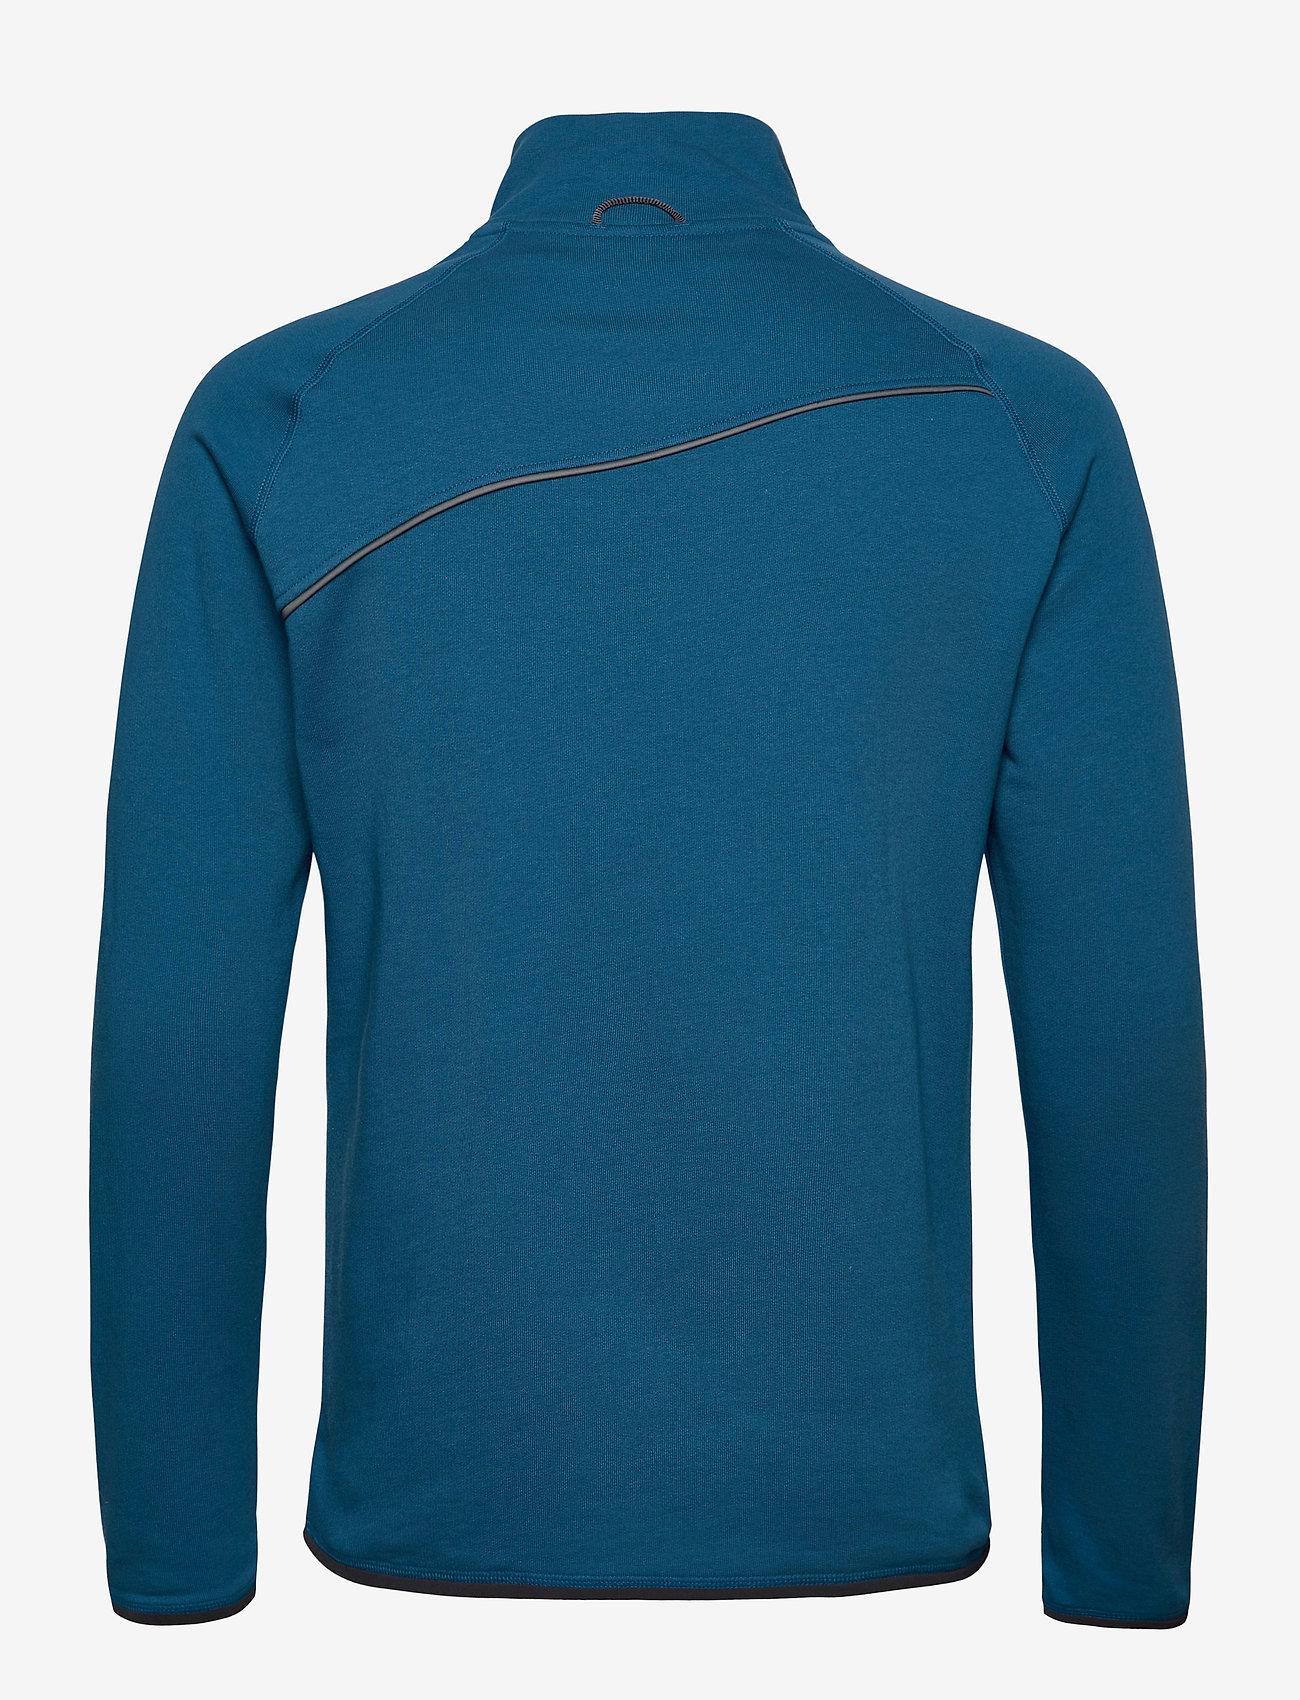 Klättermusen - Falen Zip M's - basic-sweatshirts - blue sapphire - 1